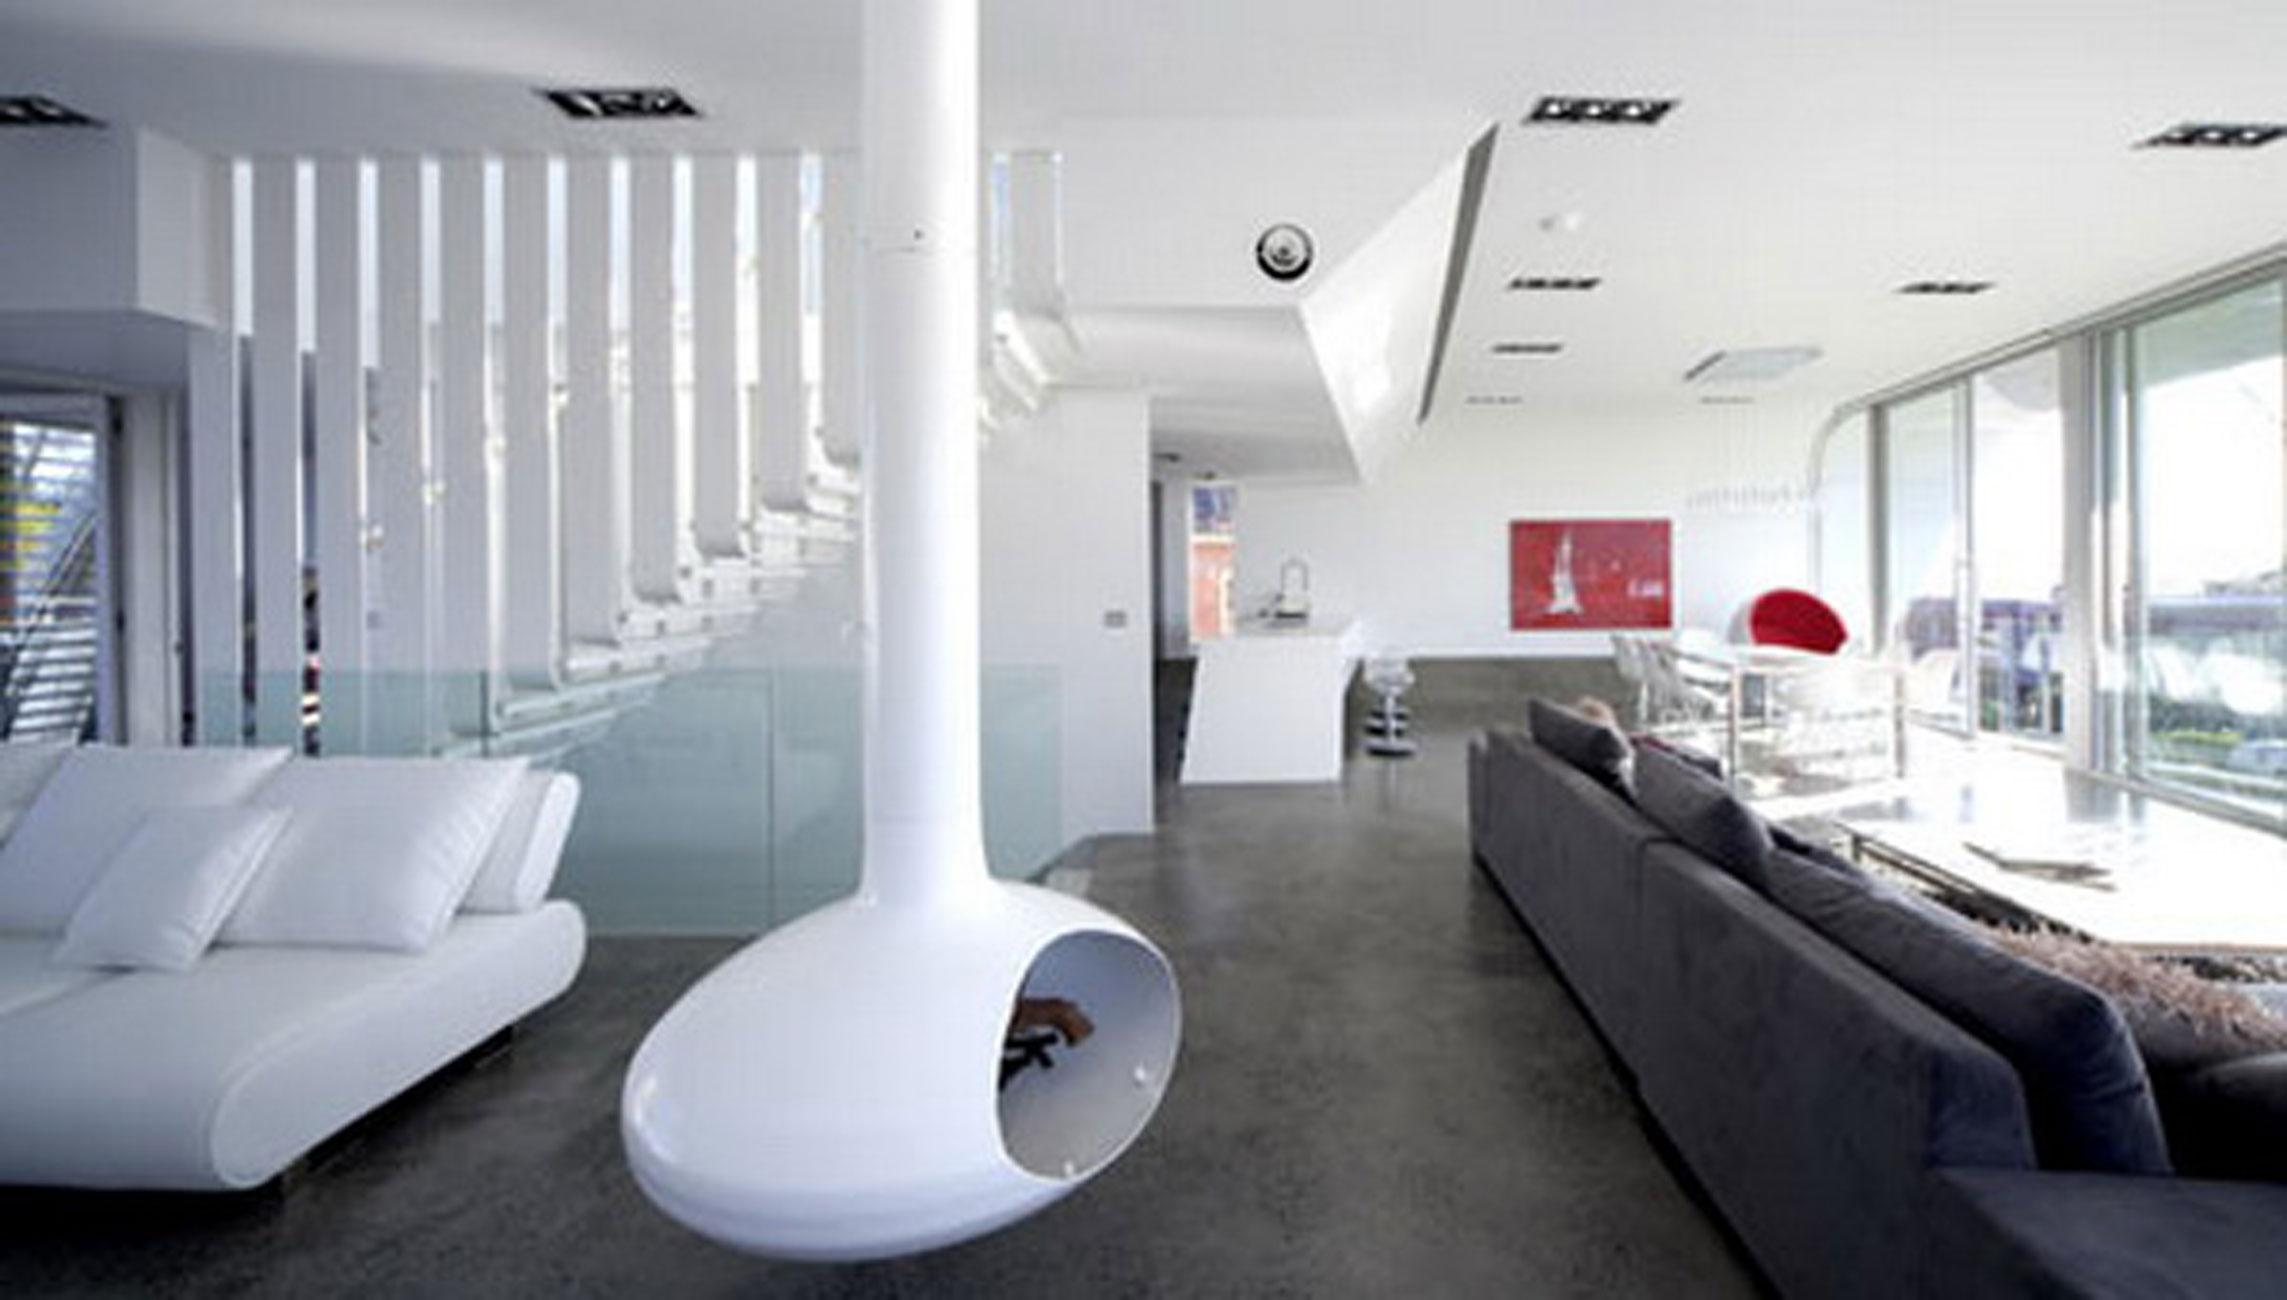 Future House Concept Moebius House From Tony Owen Partners Livingroom